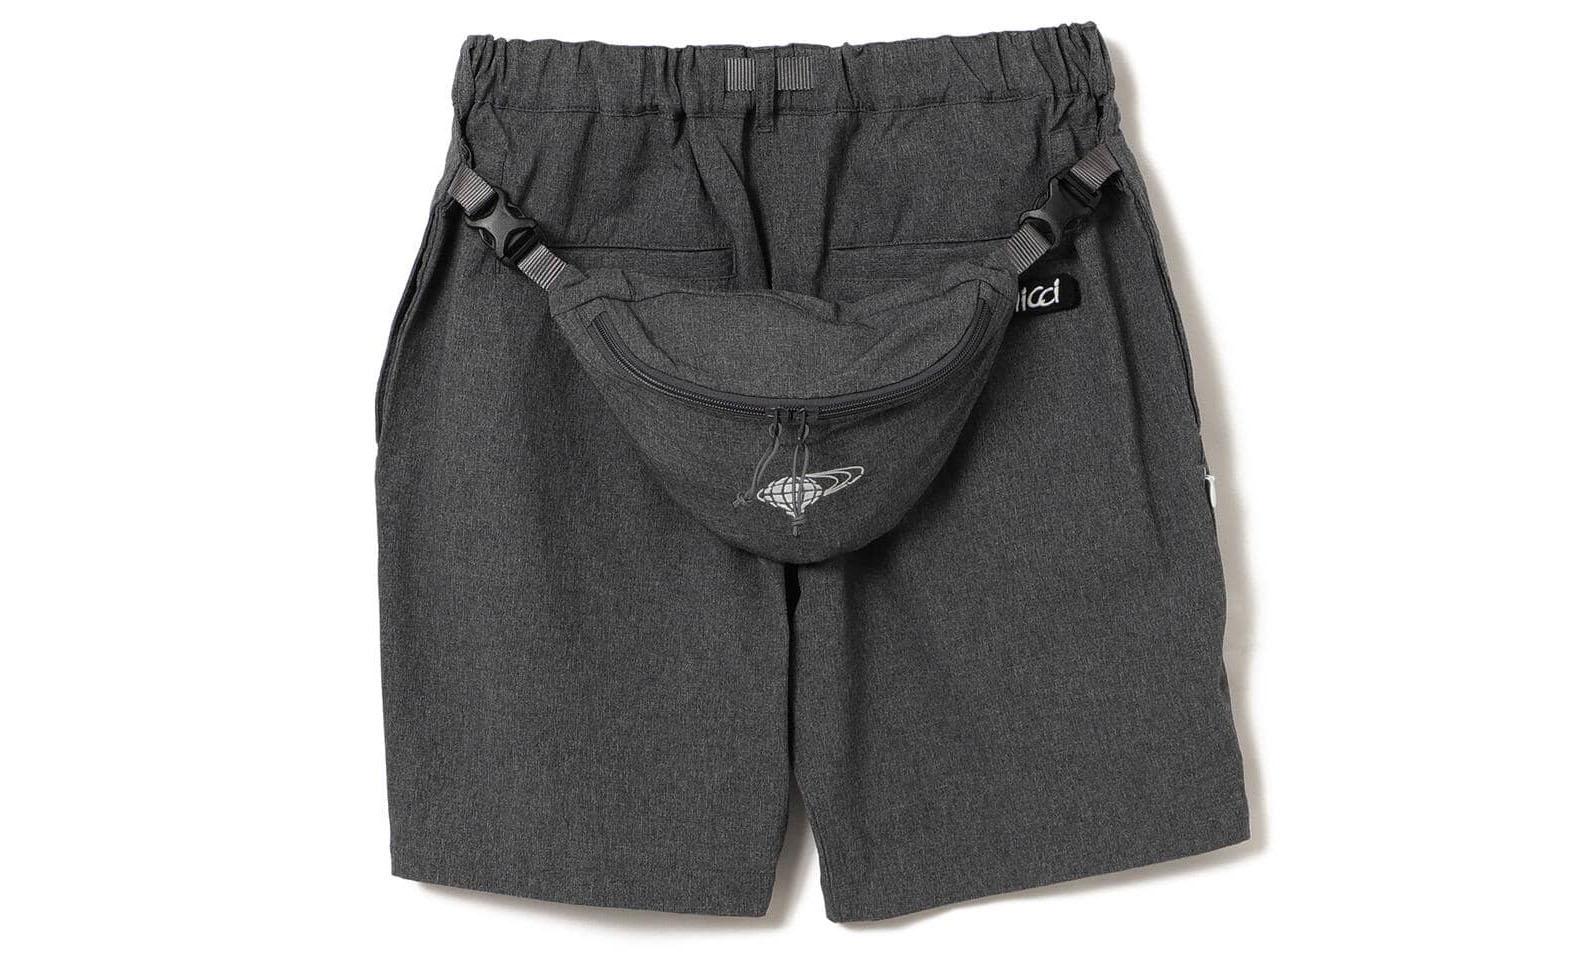 BEAMS GOLF 与 Gramicci 携手打造功能性短裤